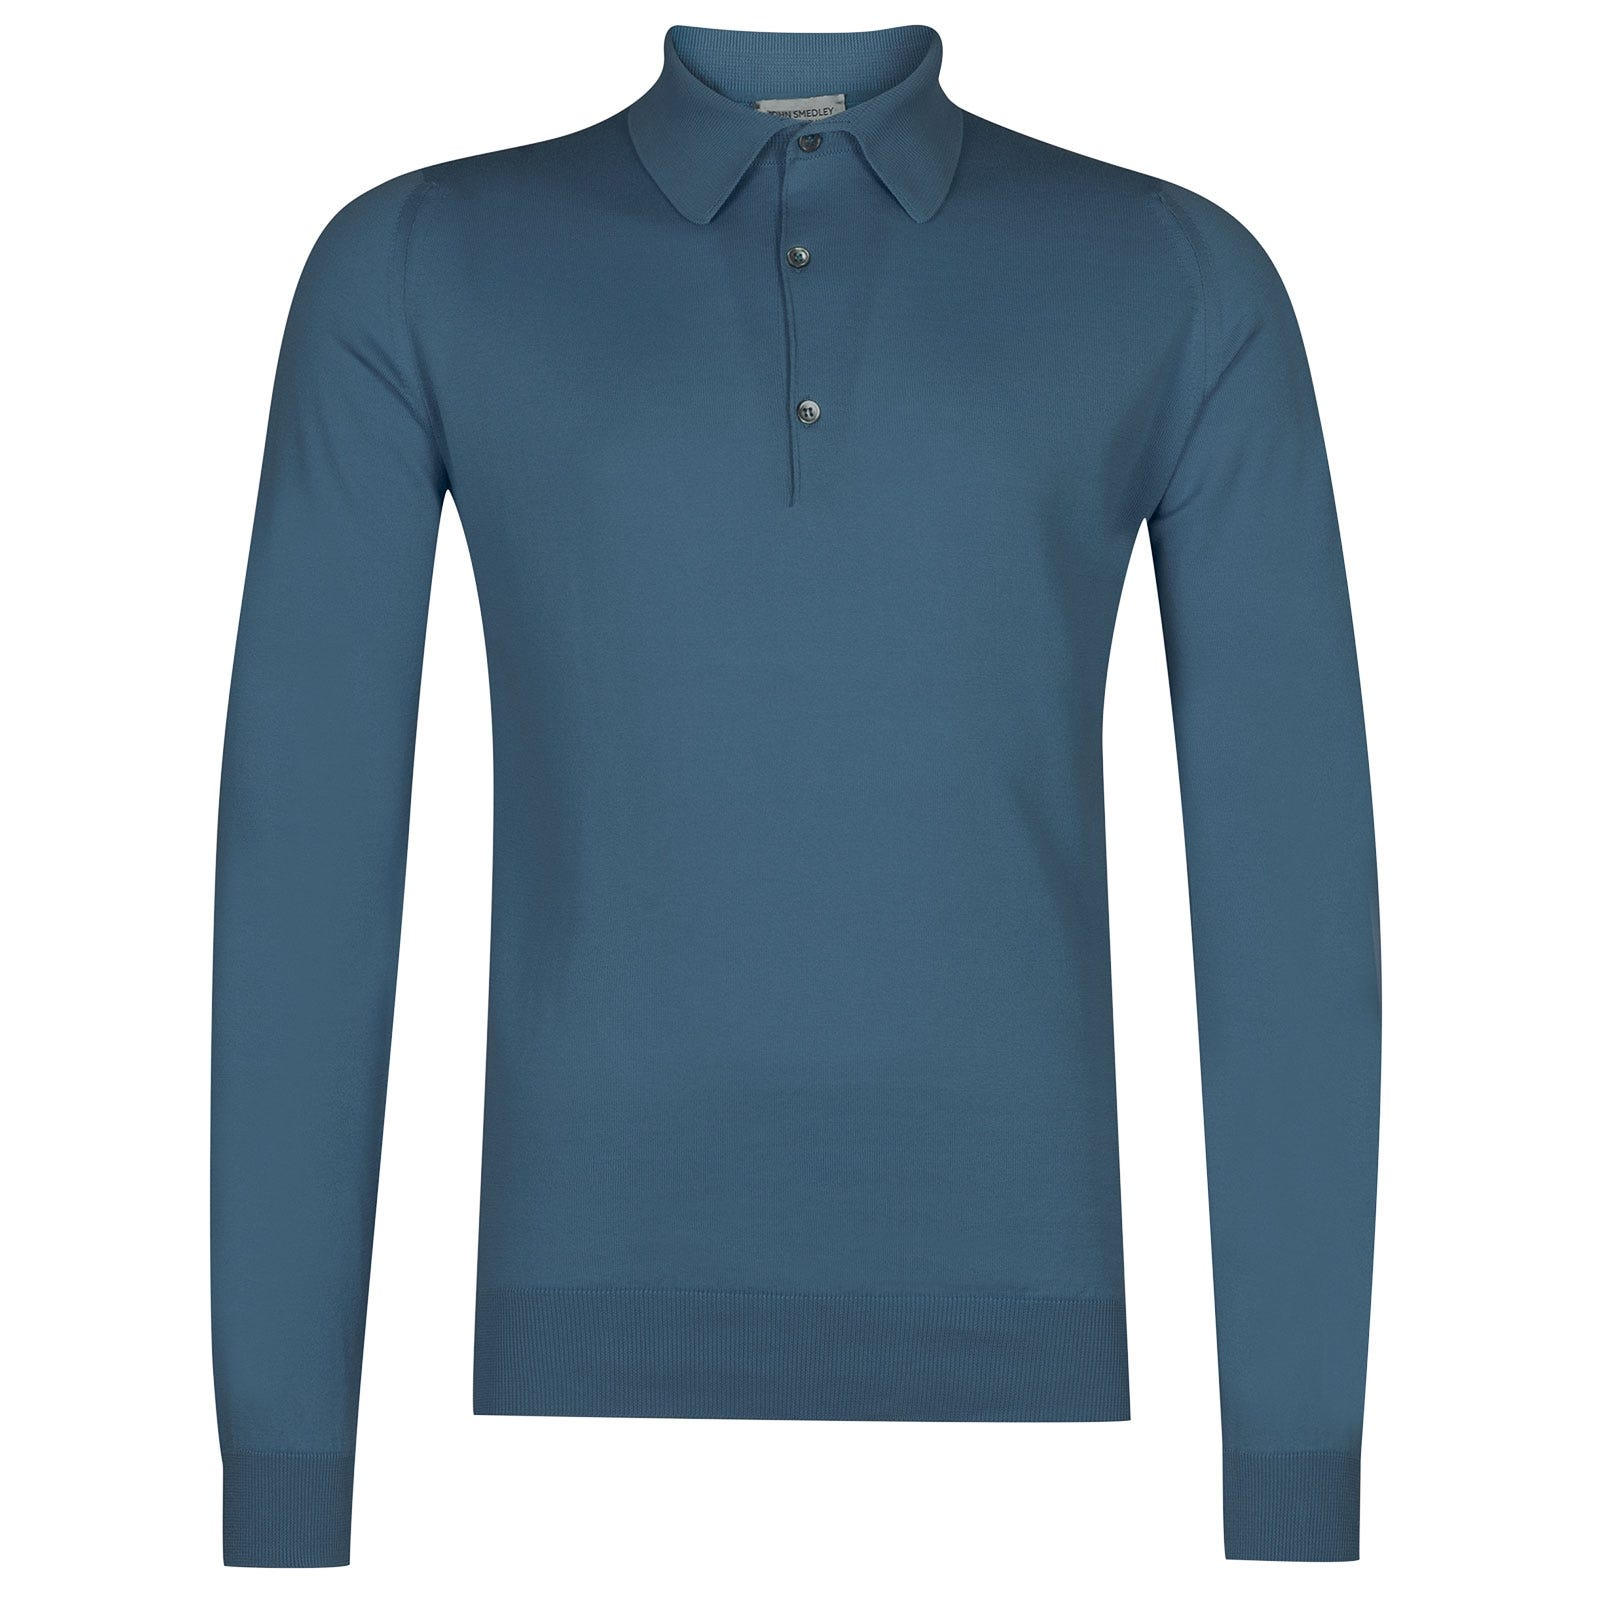 John Smedley Bradwell Sea Island Cotton Shirt in Bias Blue-M